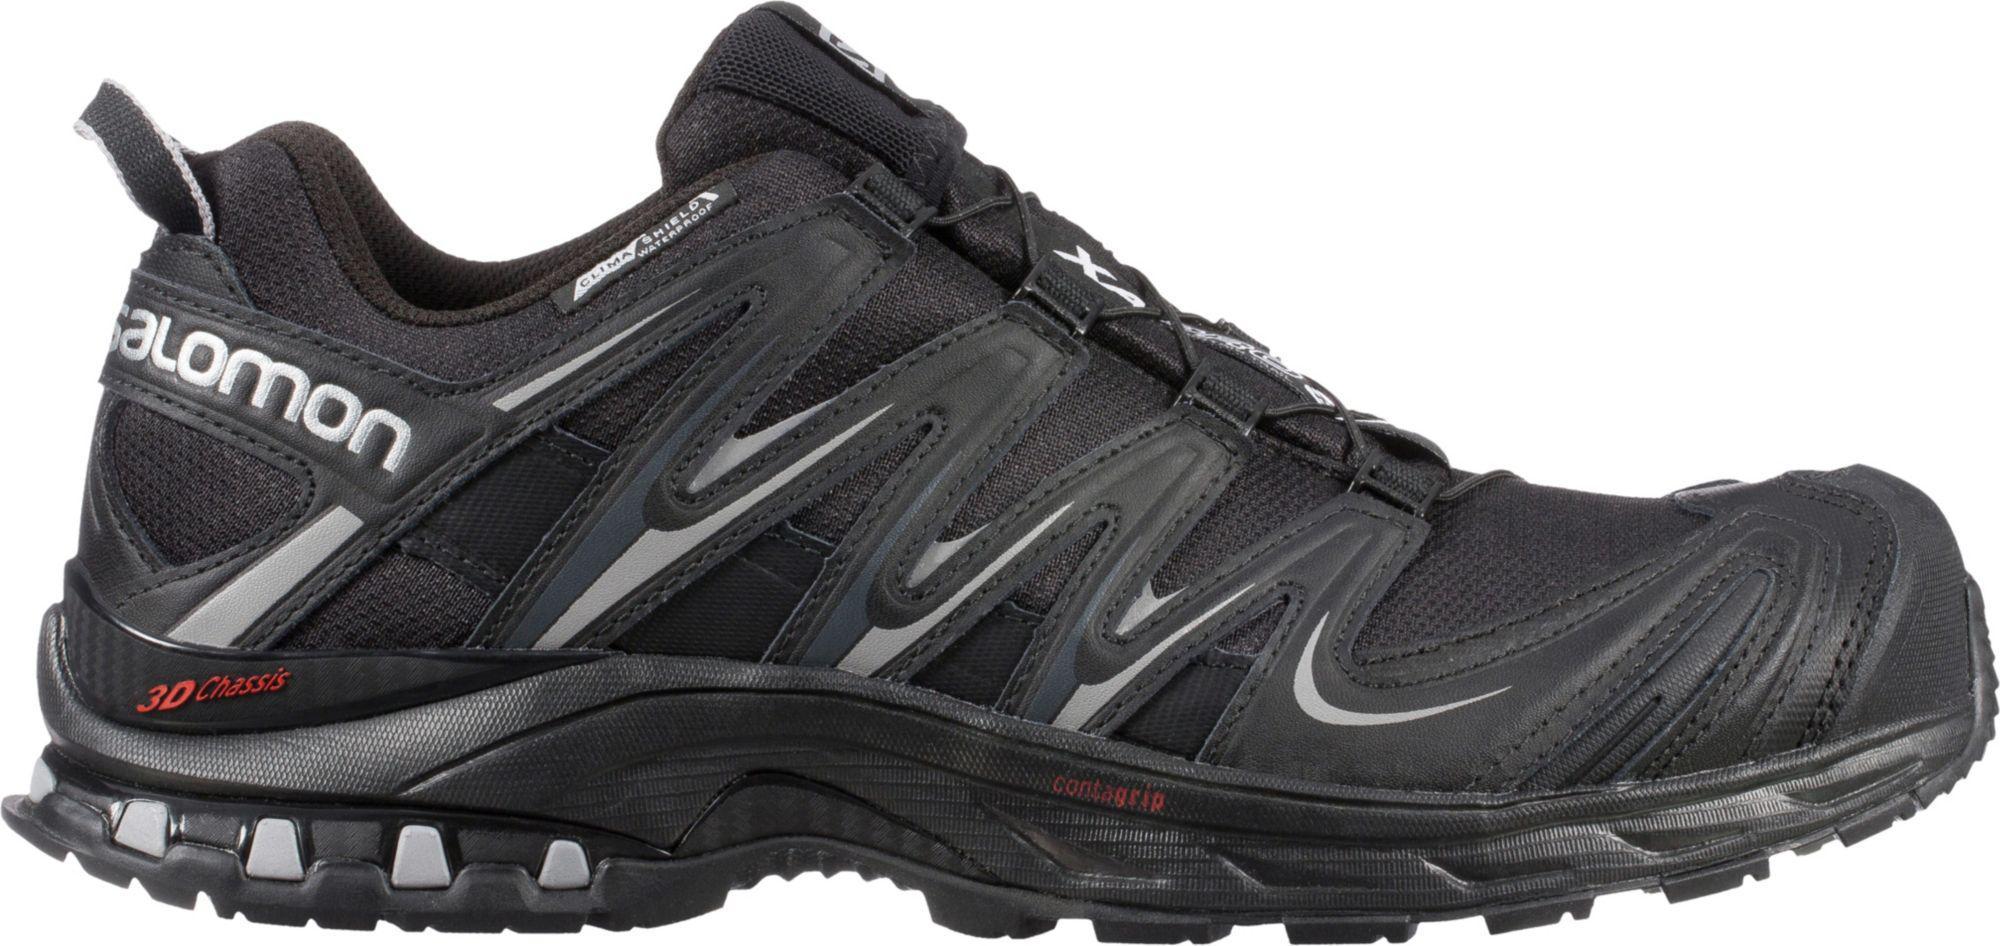 Pro Shoes Cs Waterproof Xa Salomon Yves Trail Lyst Running In 3d W2EHIYD9